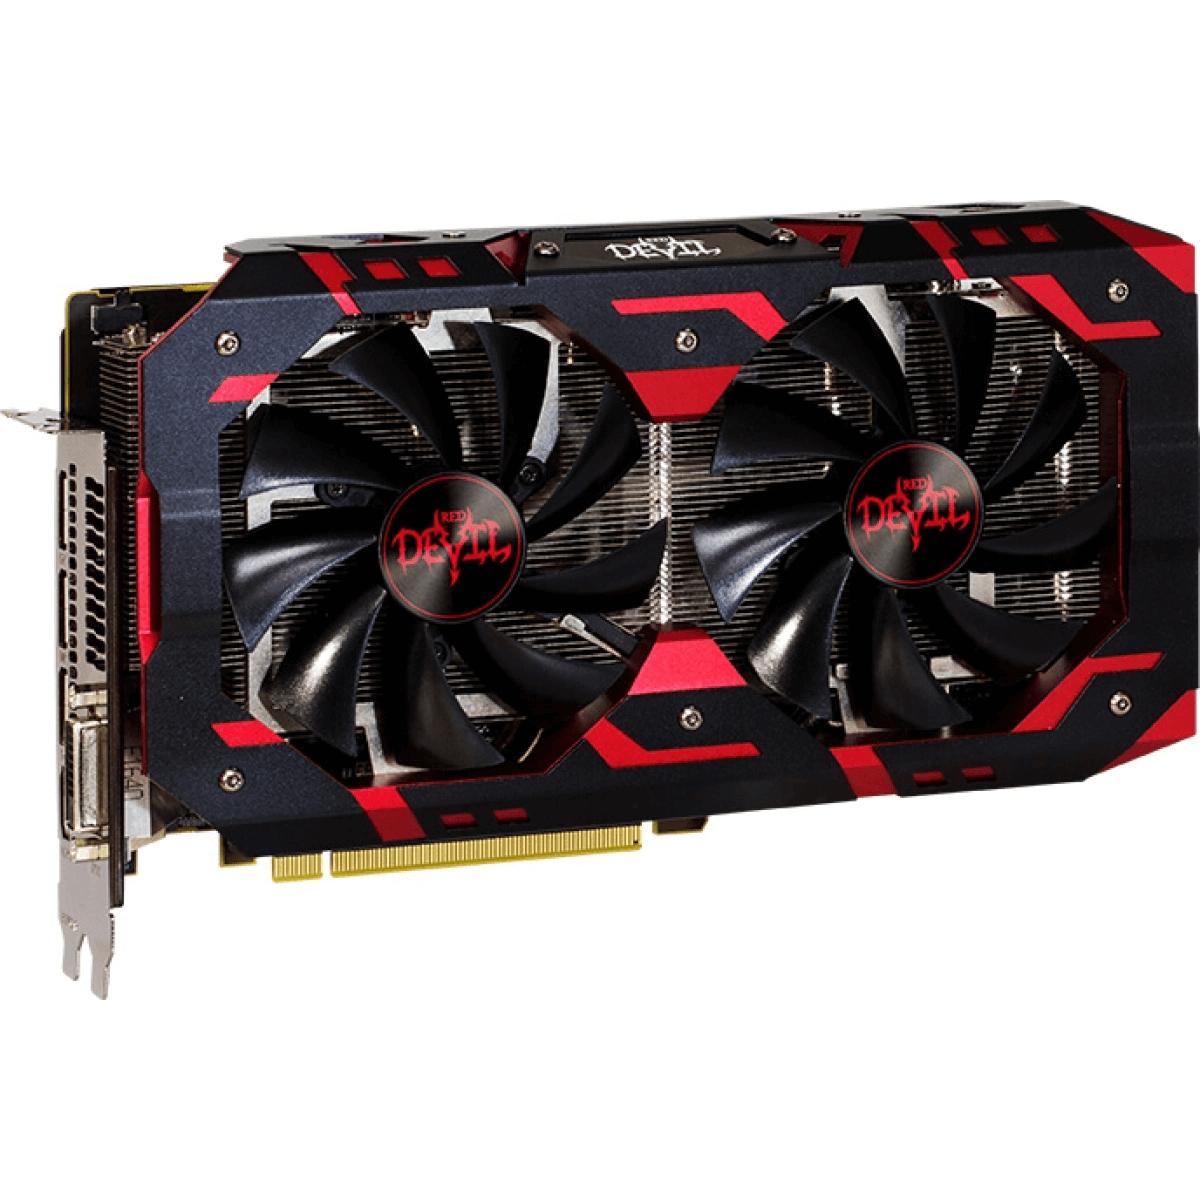 Placa de Vídeo PowerColor Radeon RX 580 Red Devil Dual 8GB GDDR5 256Bit AXRX 580 8GBD5-3DH/OC